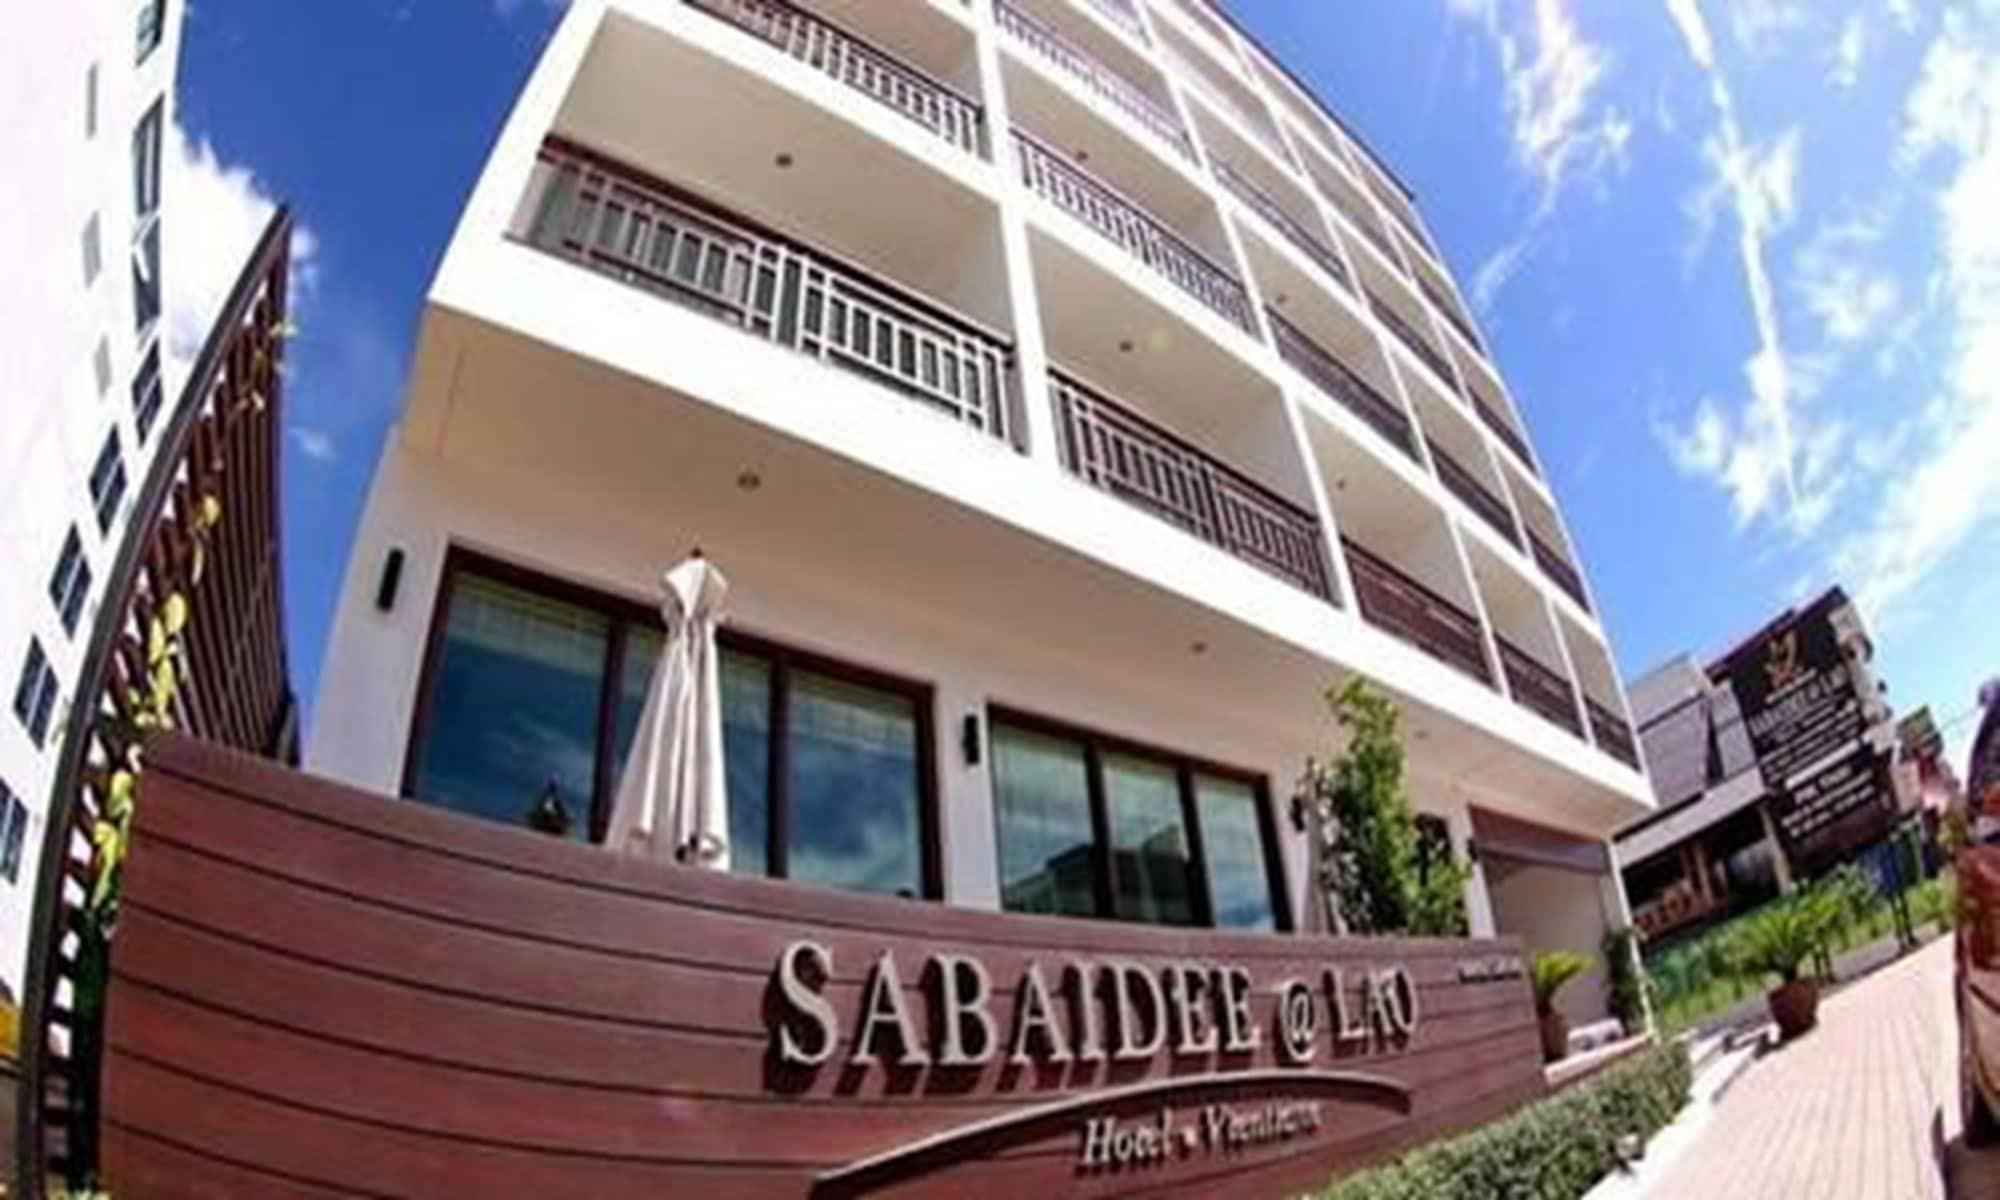 Sabaidee @ Lao Hotel, Chanthabuly